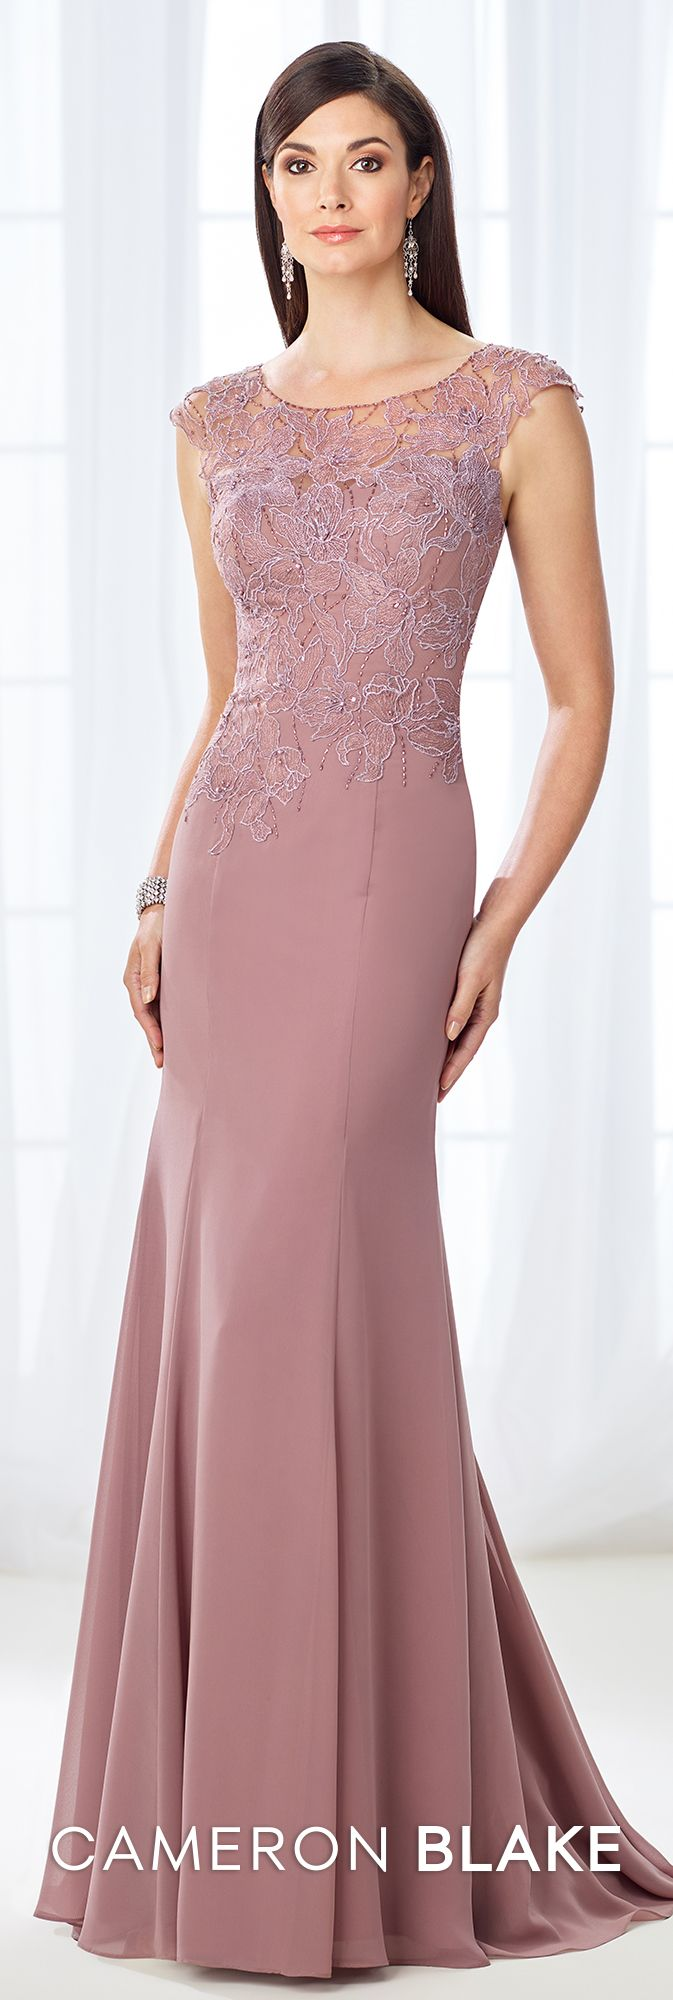 Cameron Blake - Evening Dresses - 118667 | Vestiditos, Vestidos ...